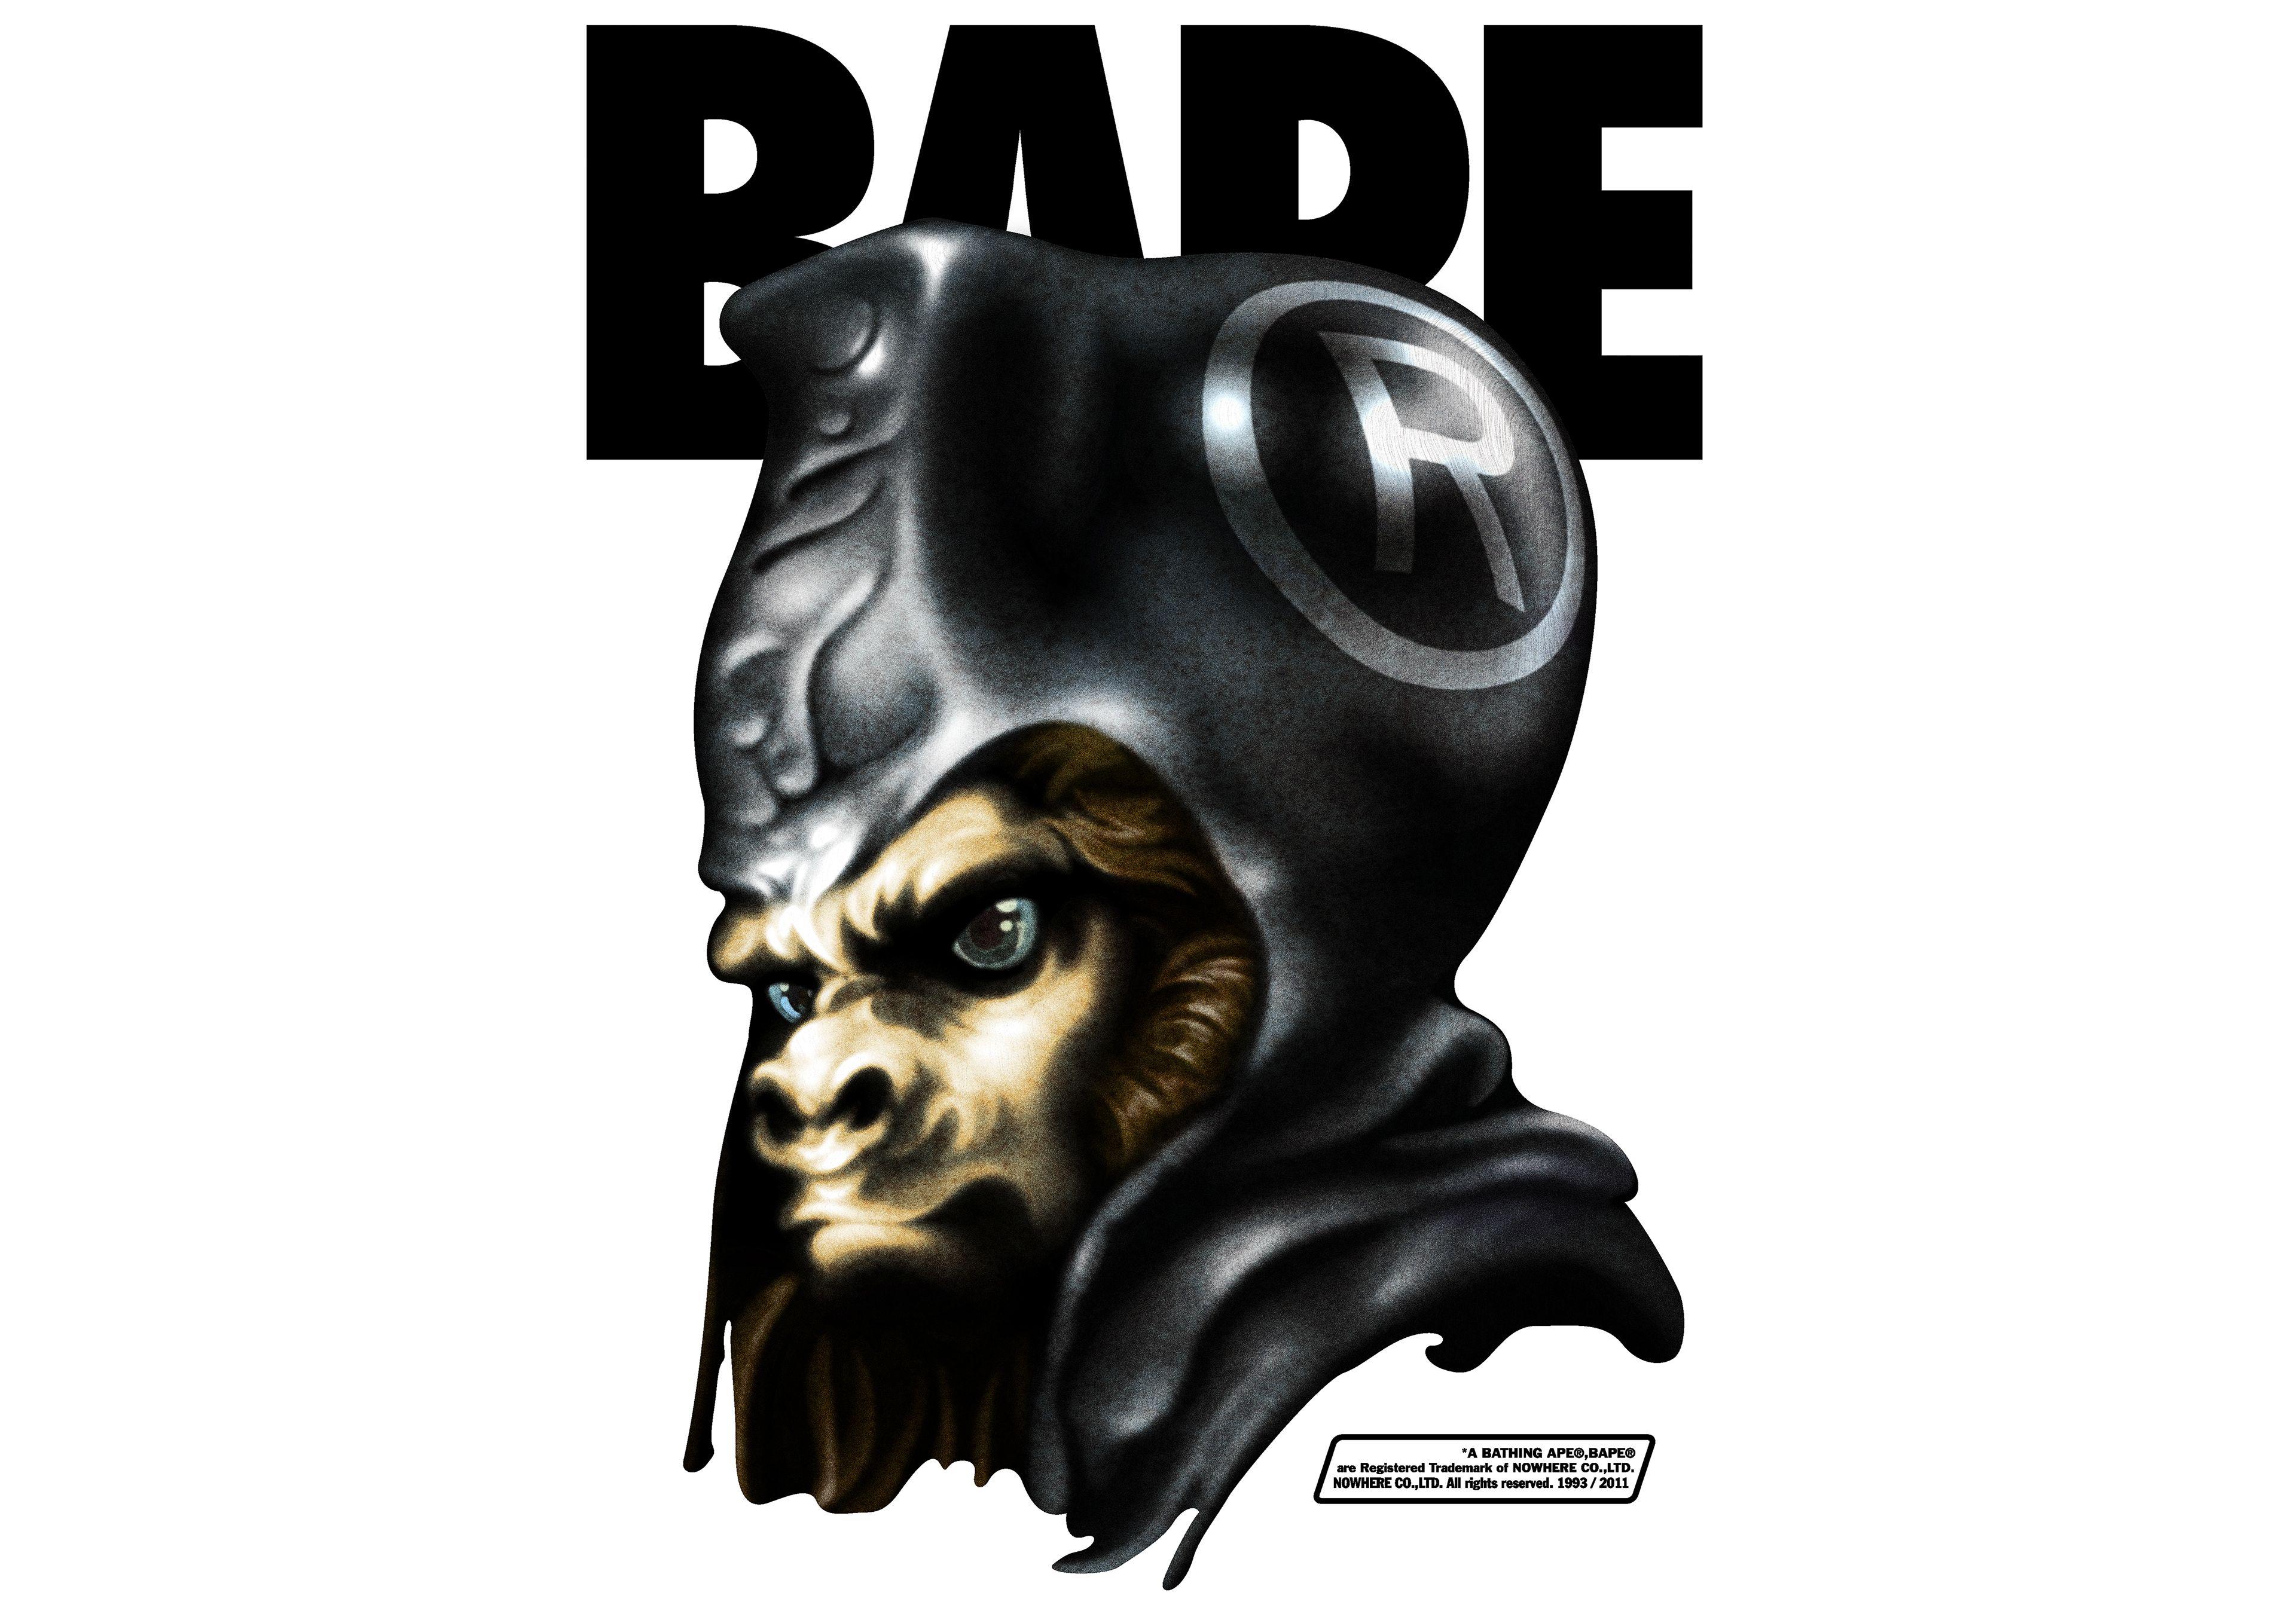 Artwork for japanese fashion label BAPE